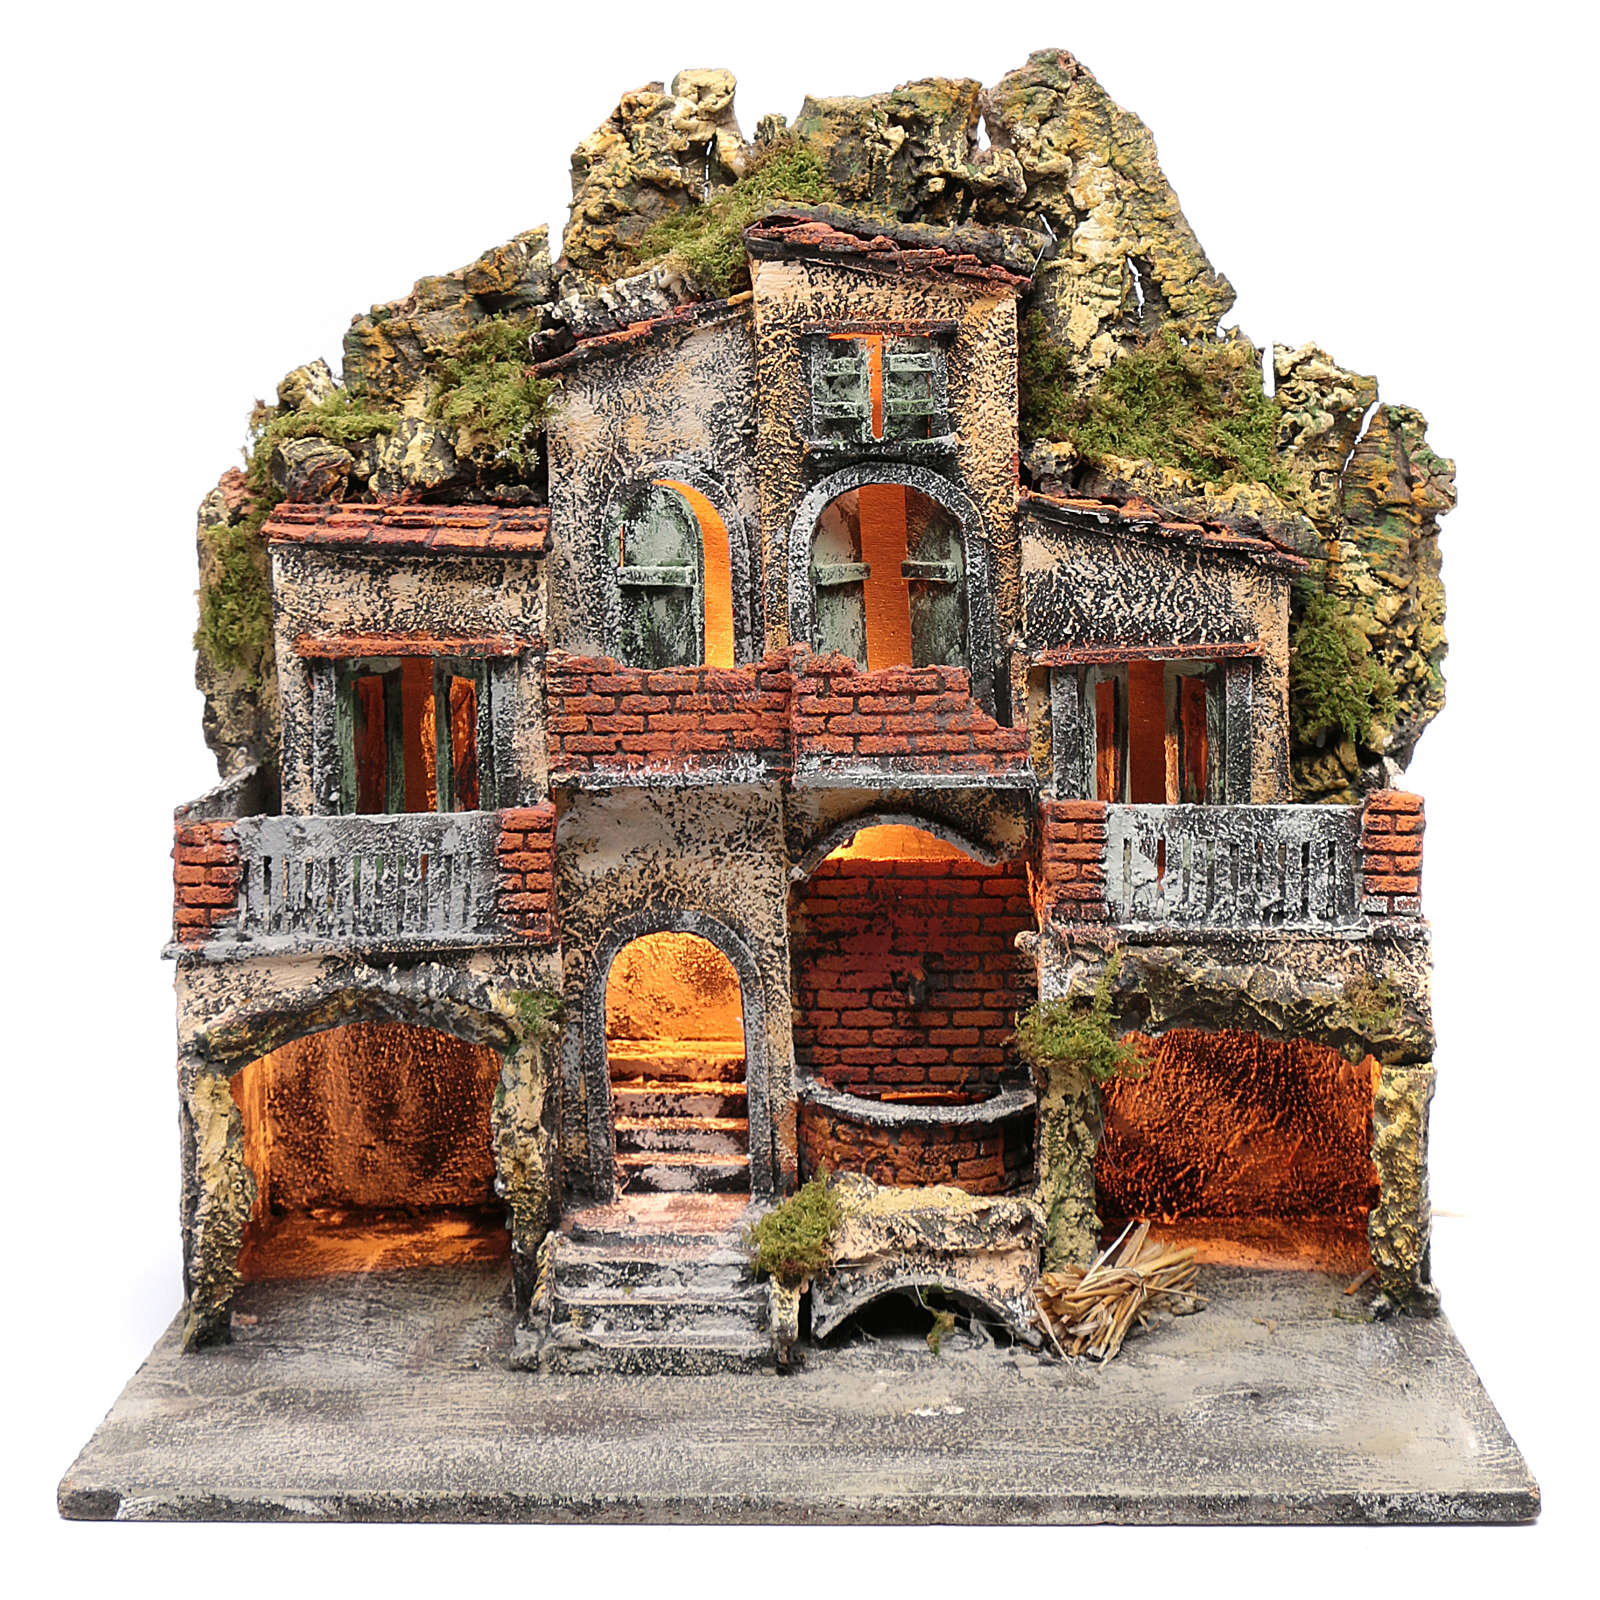 Borgo con due capanne 50x50x35 cm con fontana e luce presepe Napoli 4